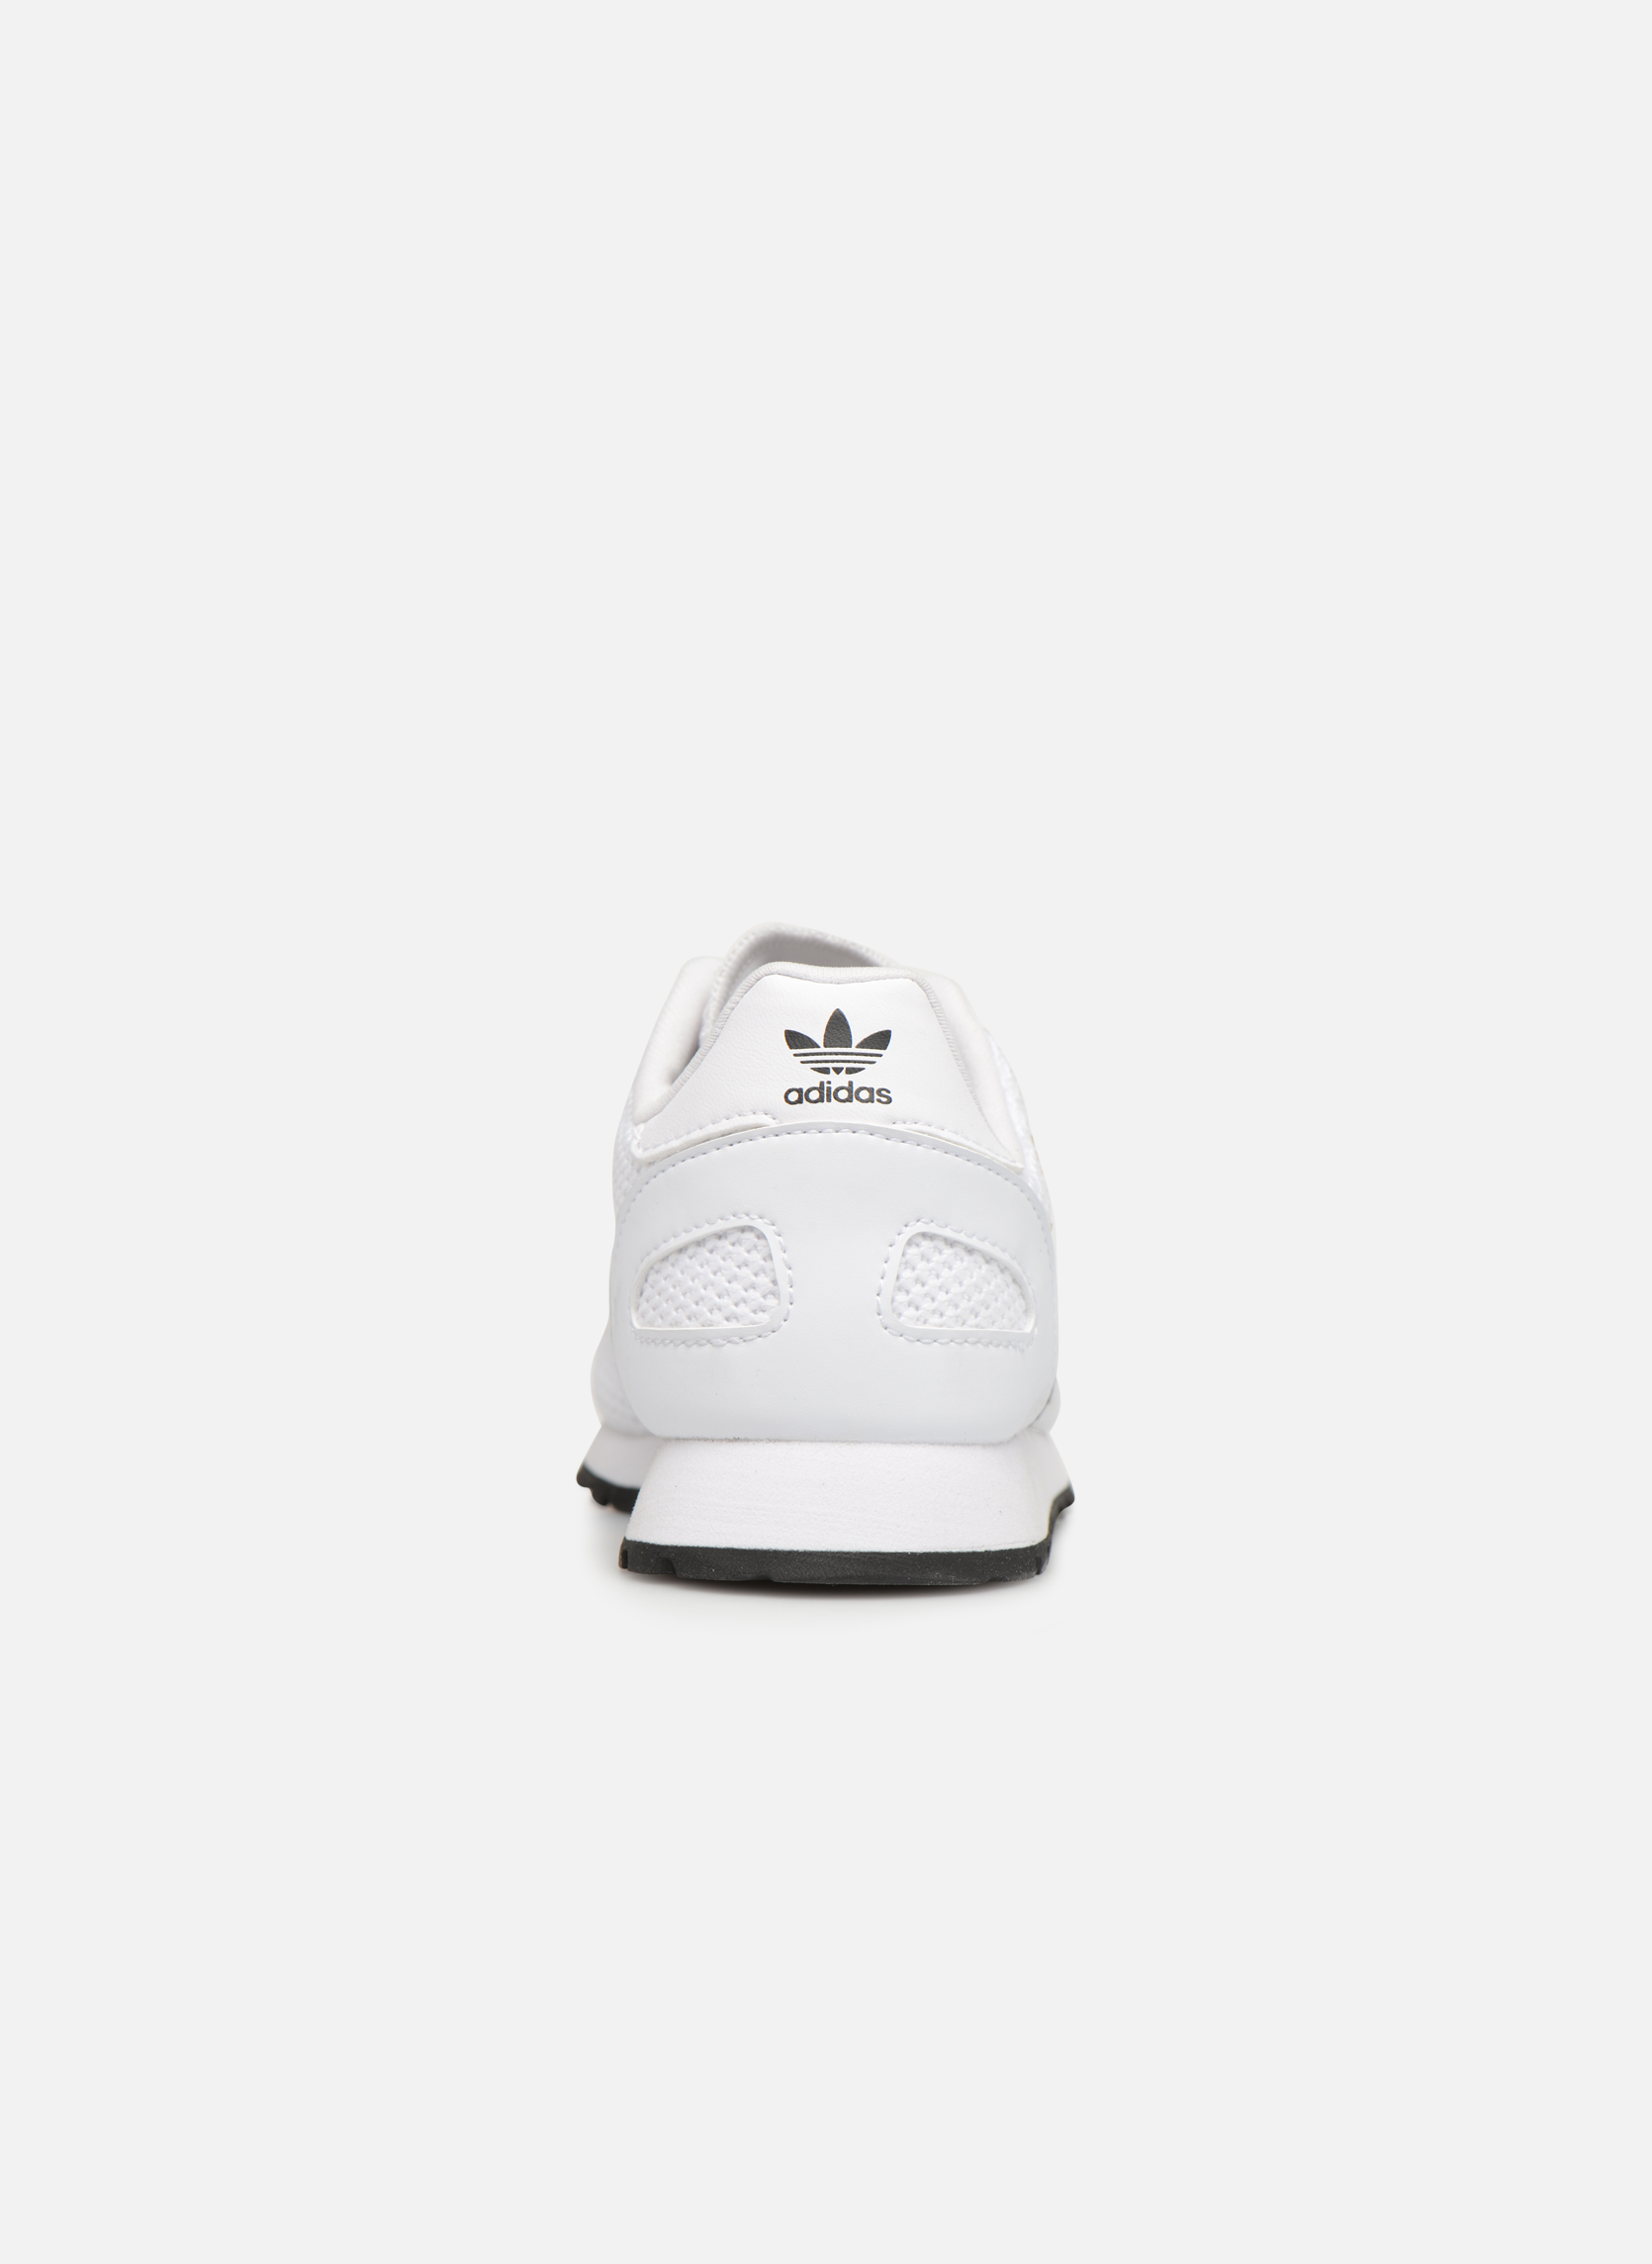 Ftwwht C Ftwwht N Originals Cblack Adidas 5923 wAqCCz